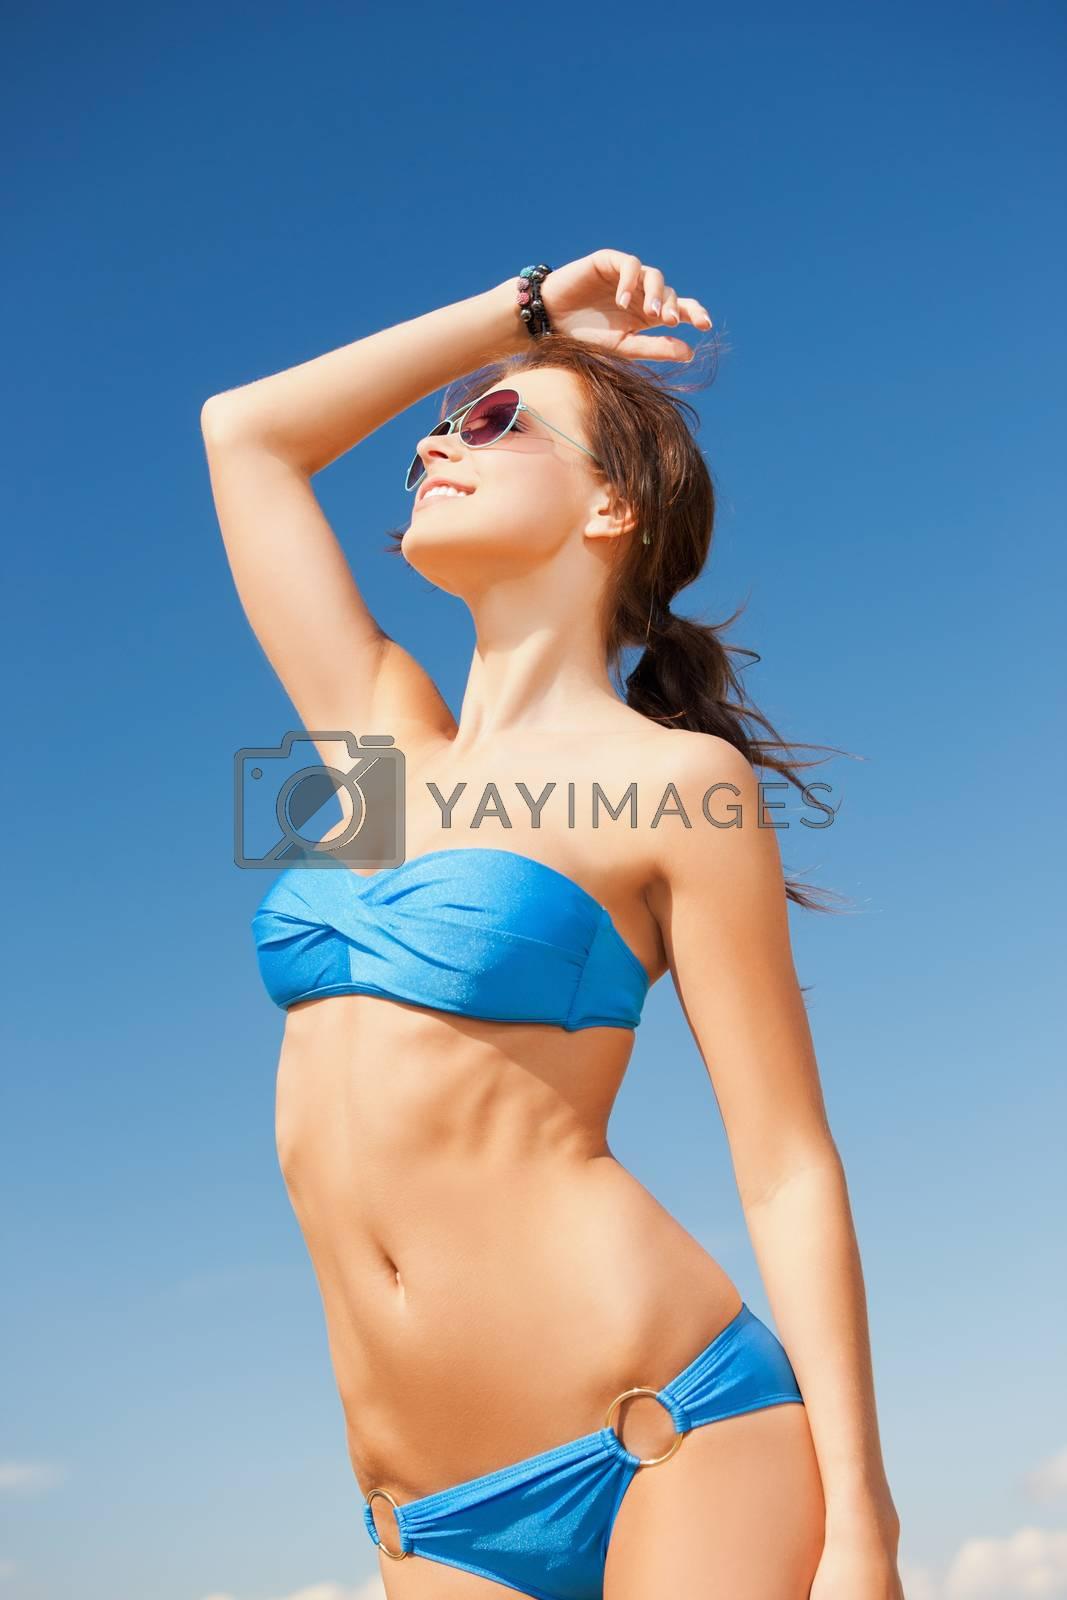 woman in bikini and sunglasses by dolgachov